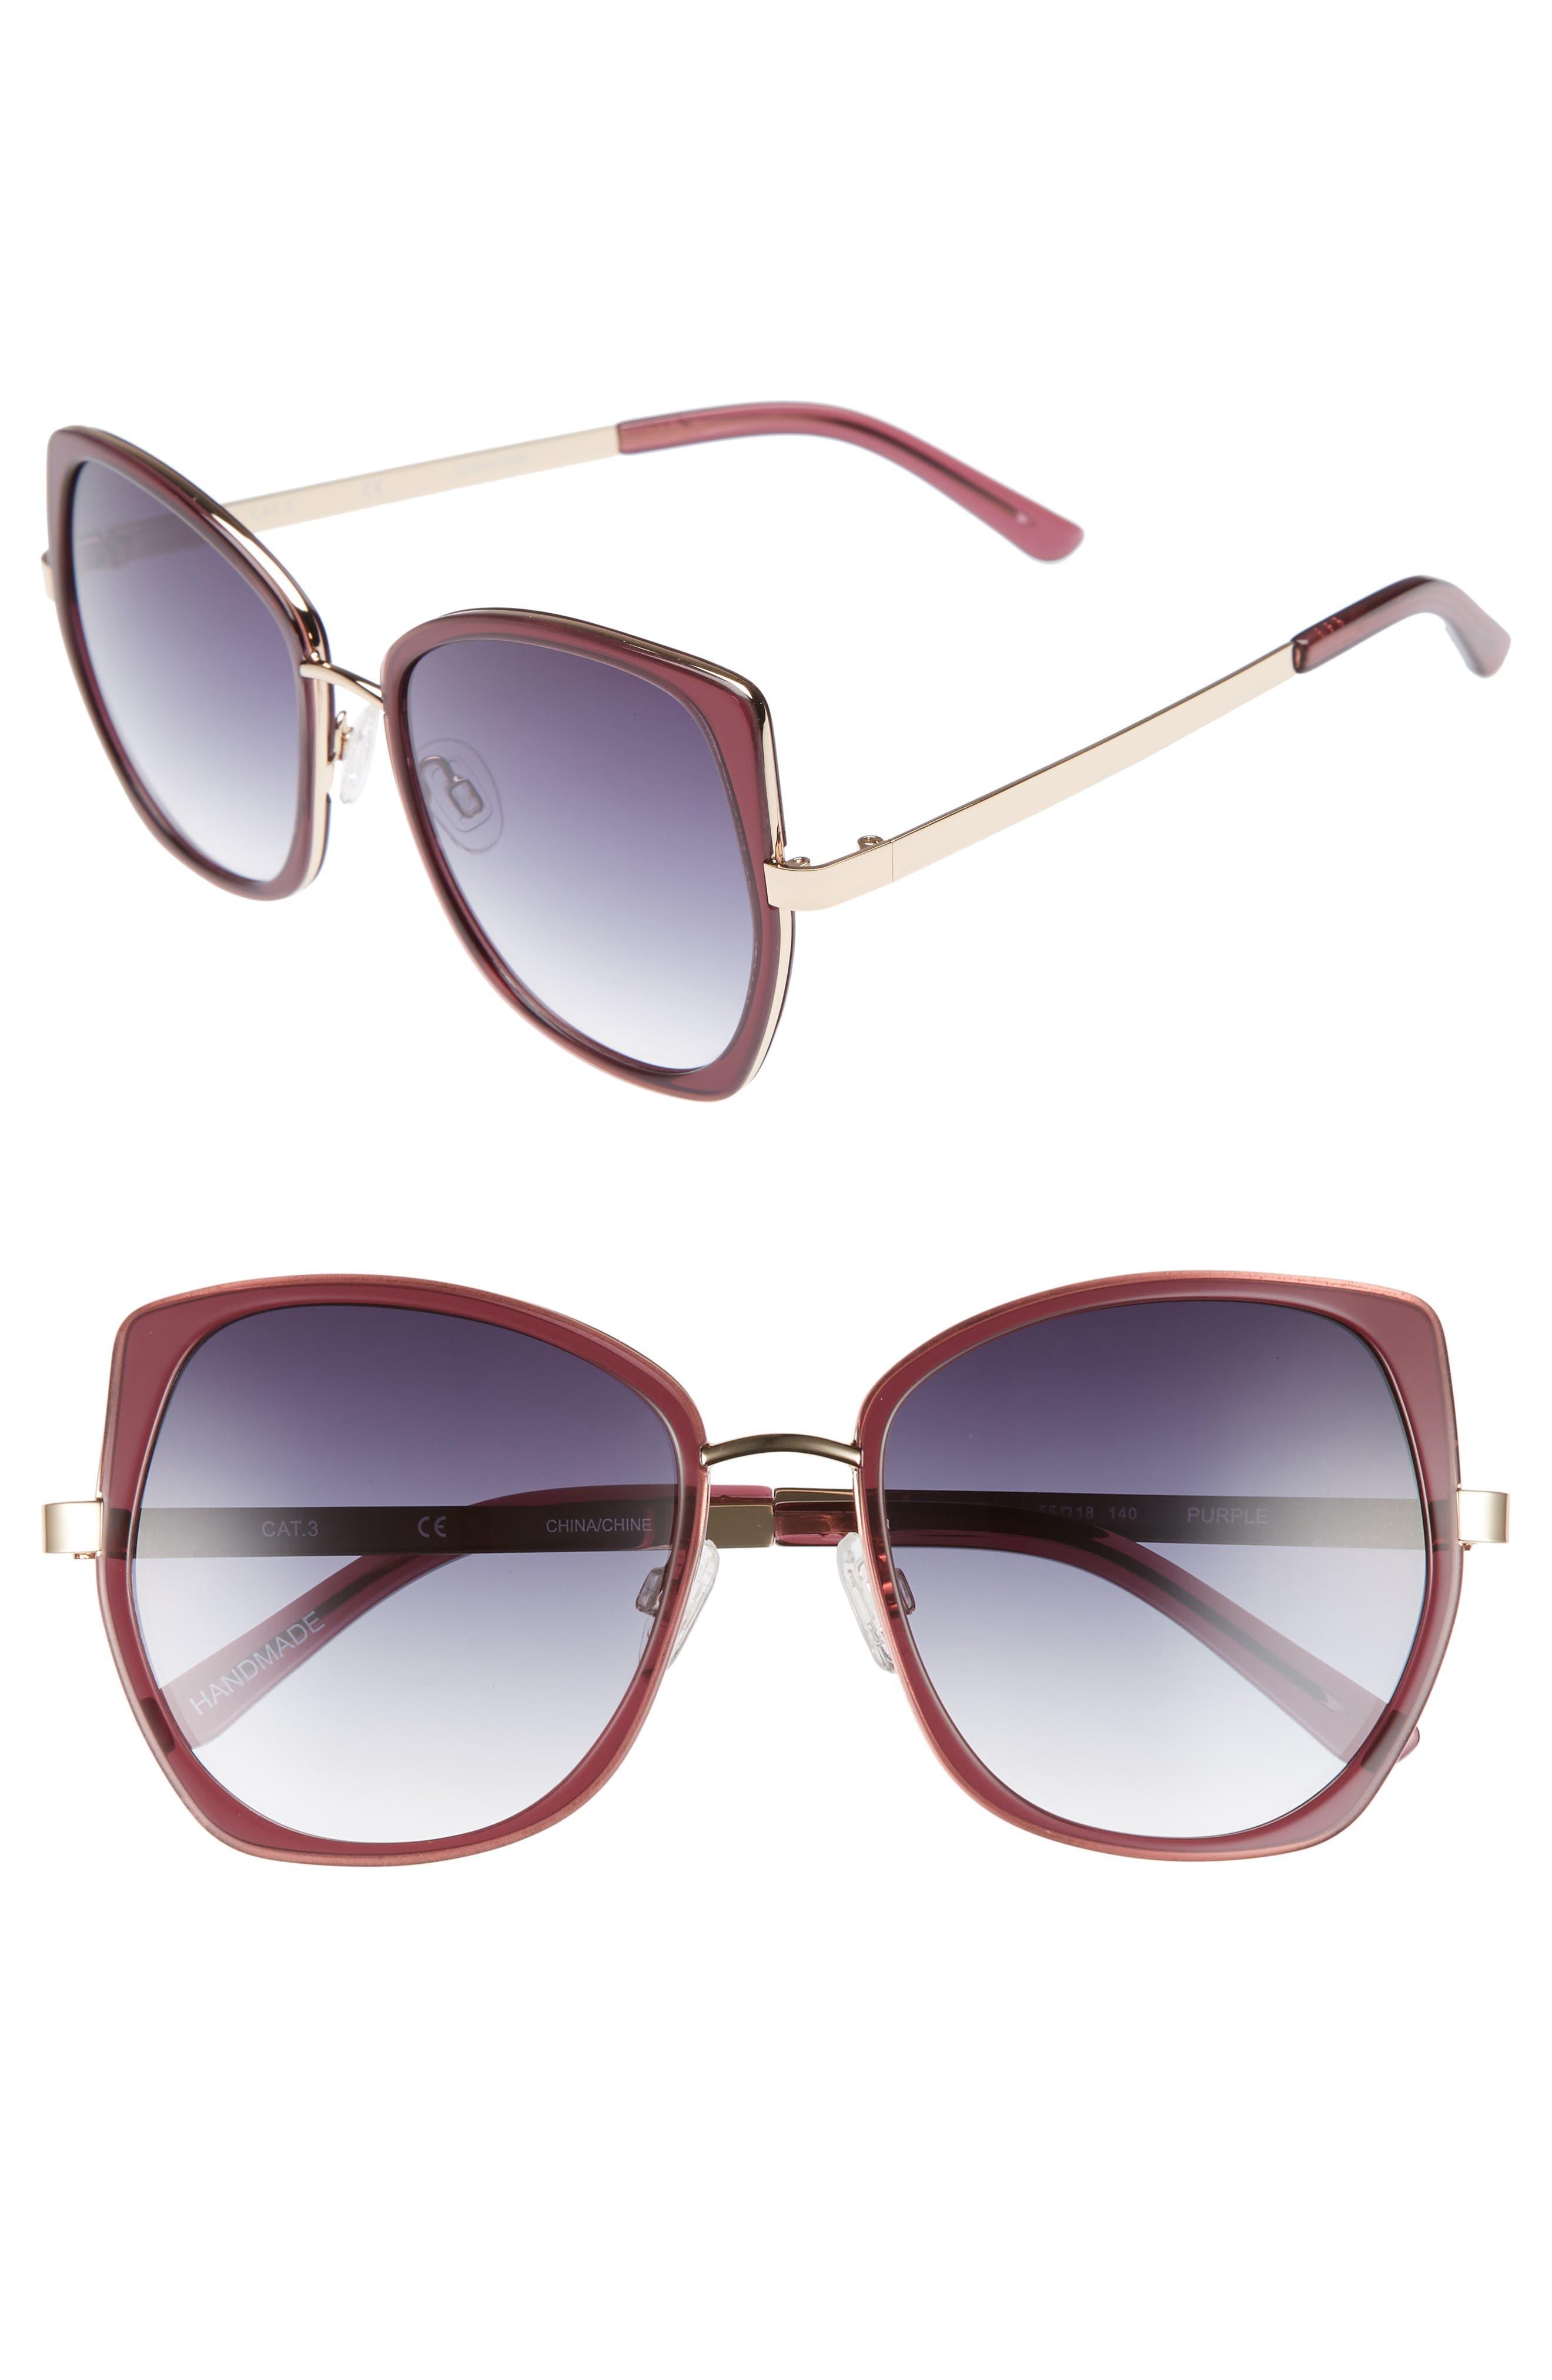 Ellie 55mm Sunglasses,                             Main thumbnail 1, color,                             MILKY GREY PURPLE